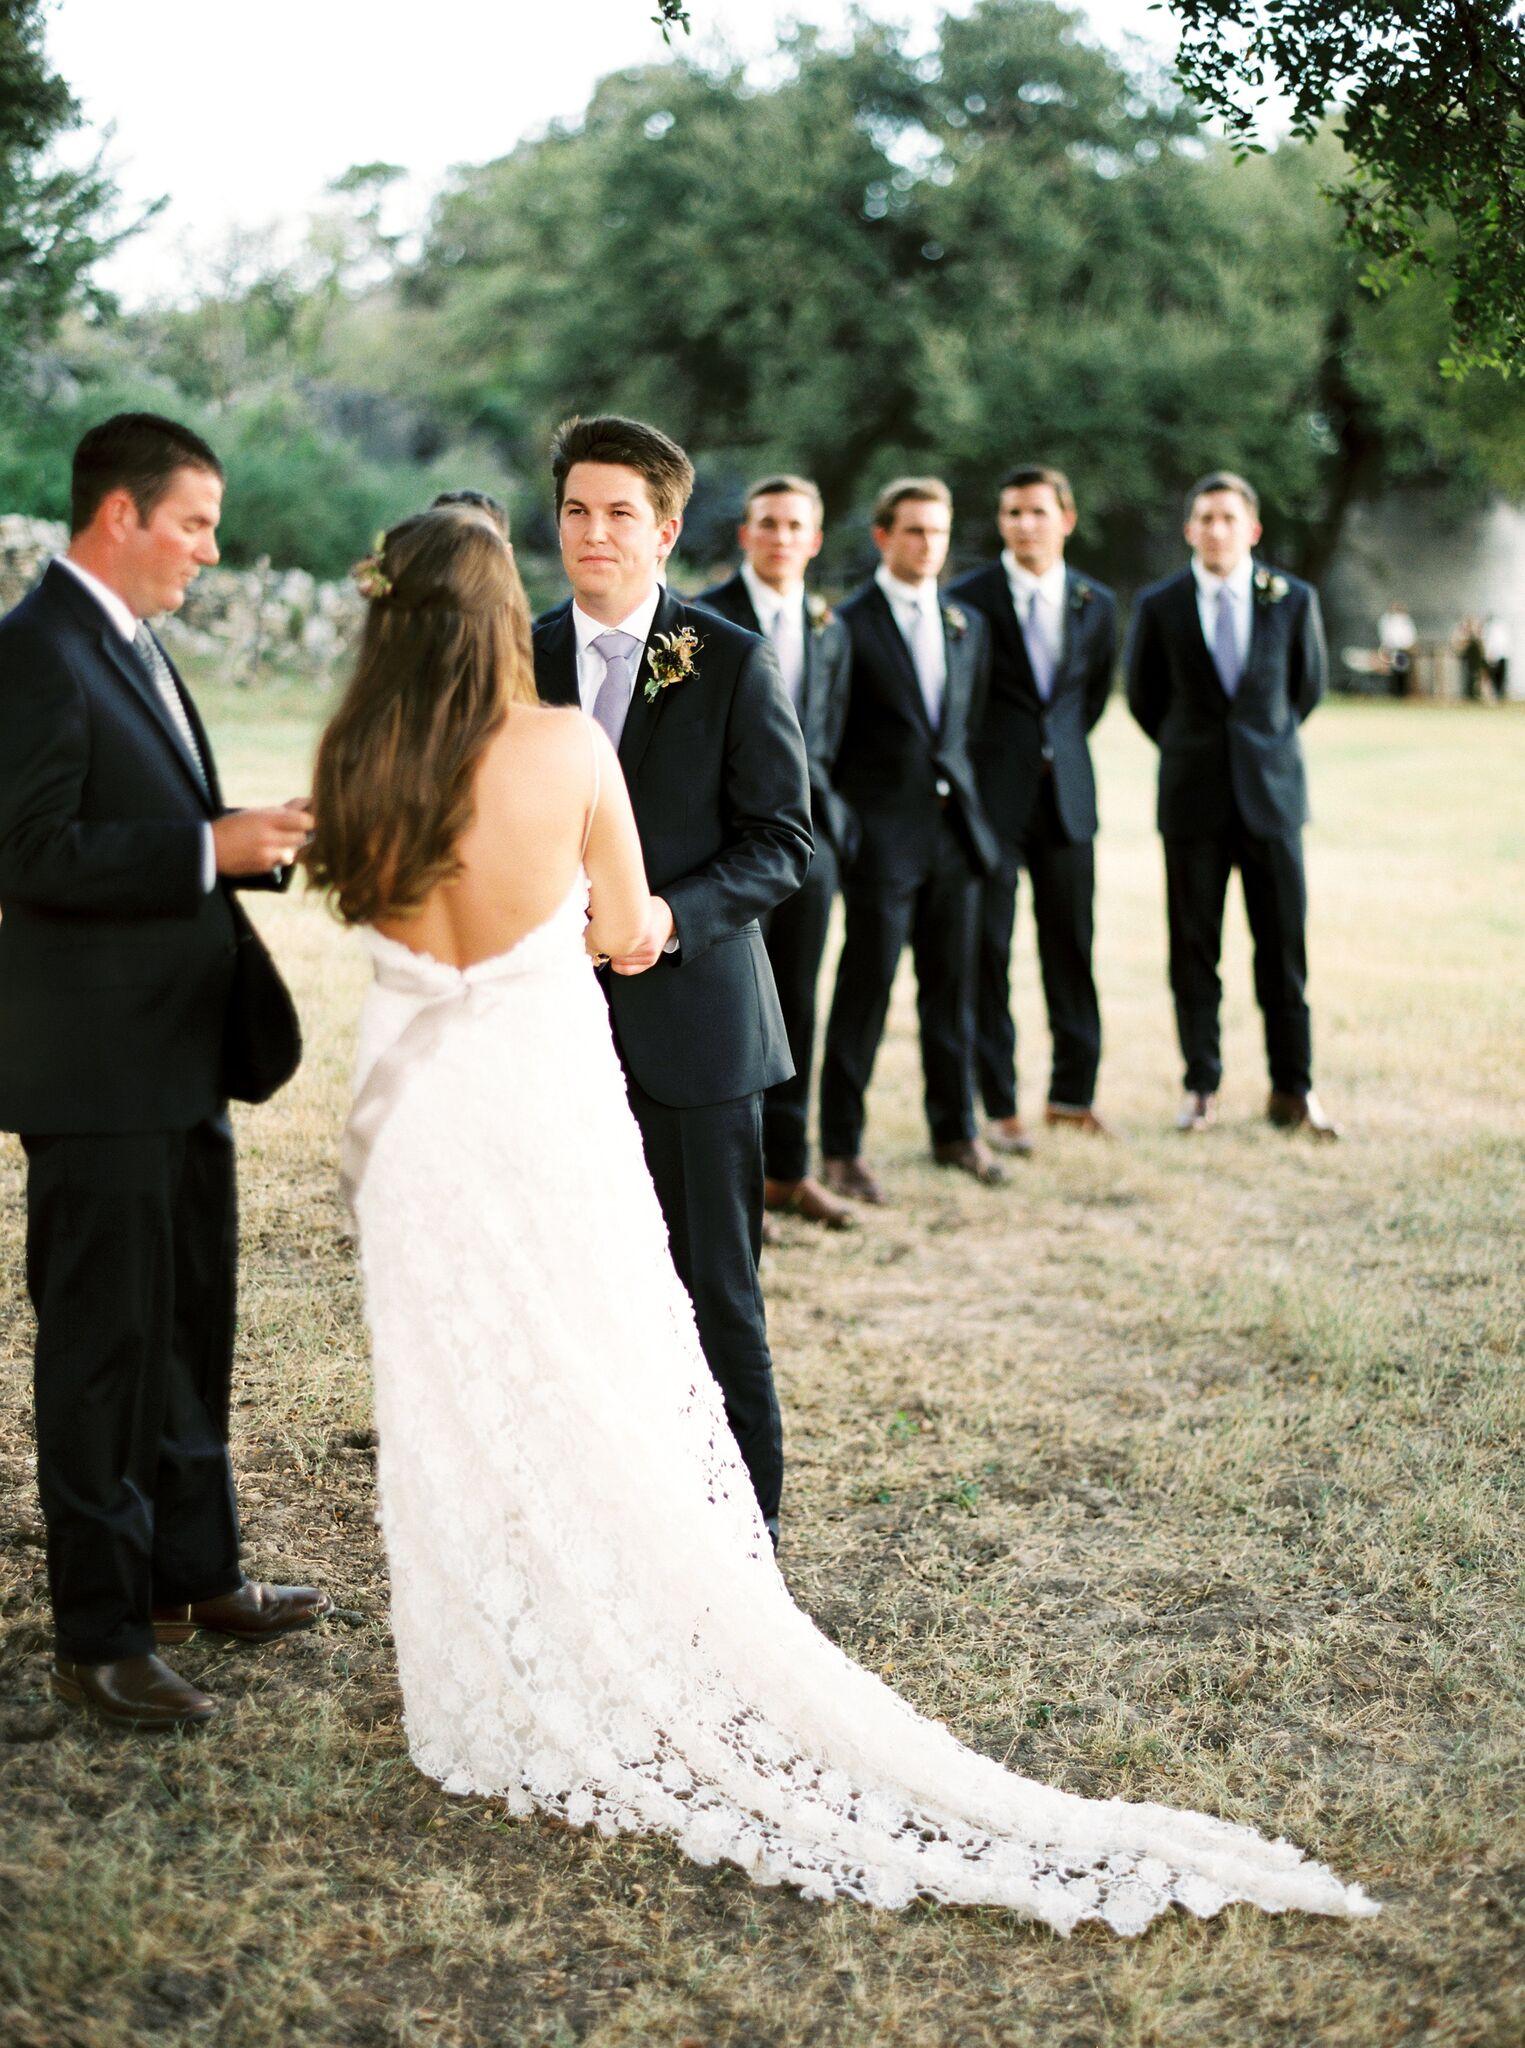 kelsey jacob wedding ceremony